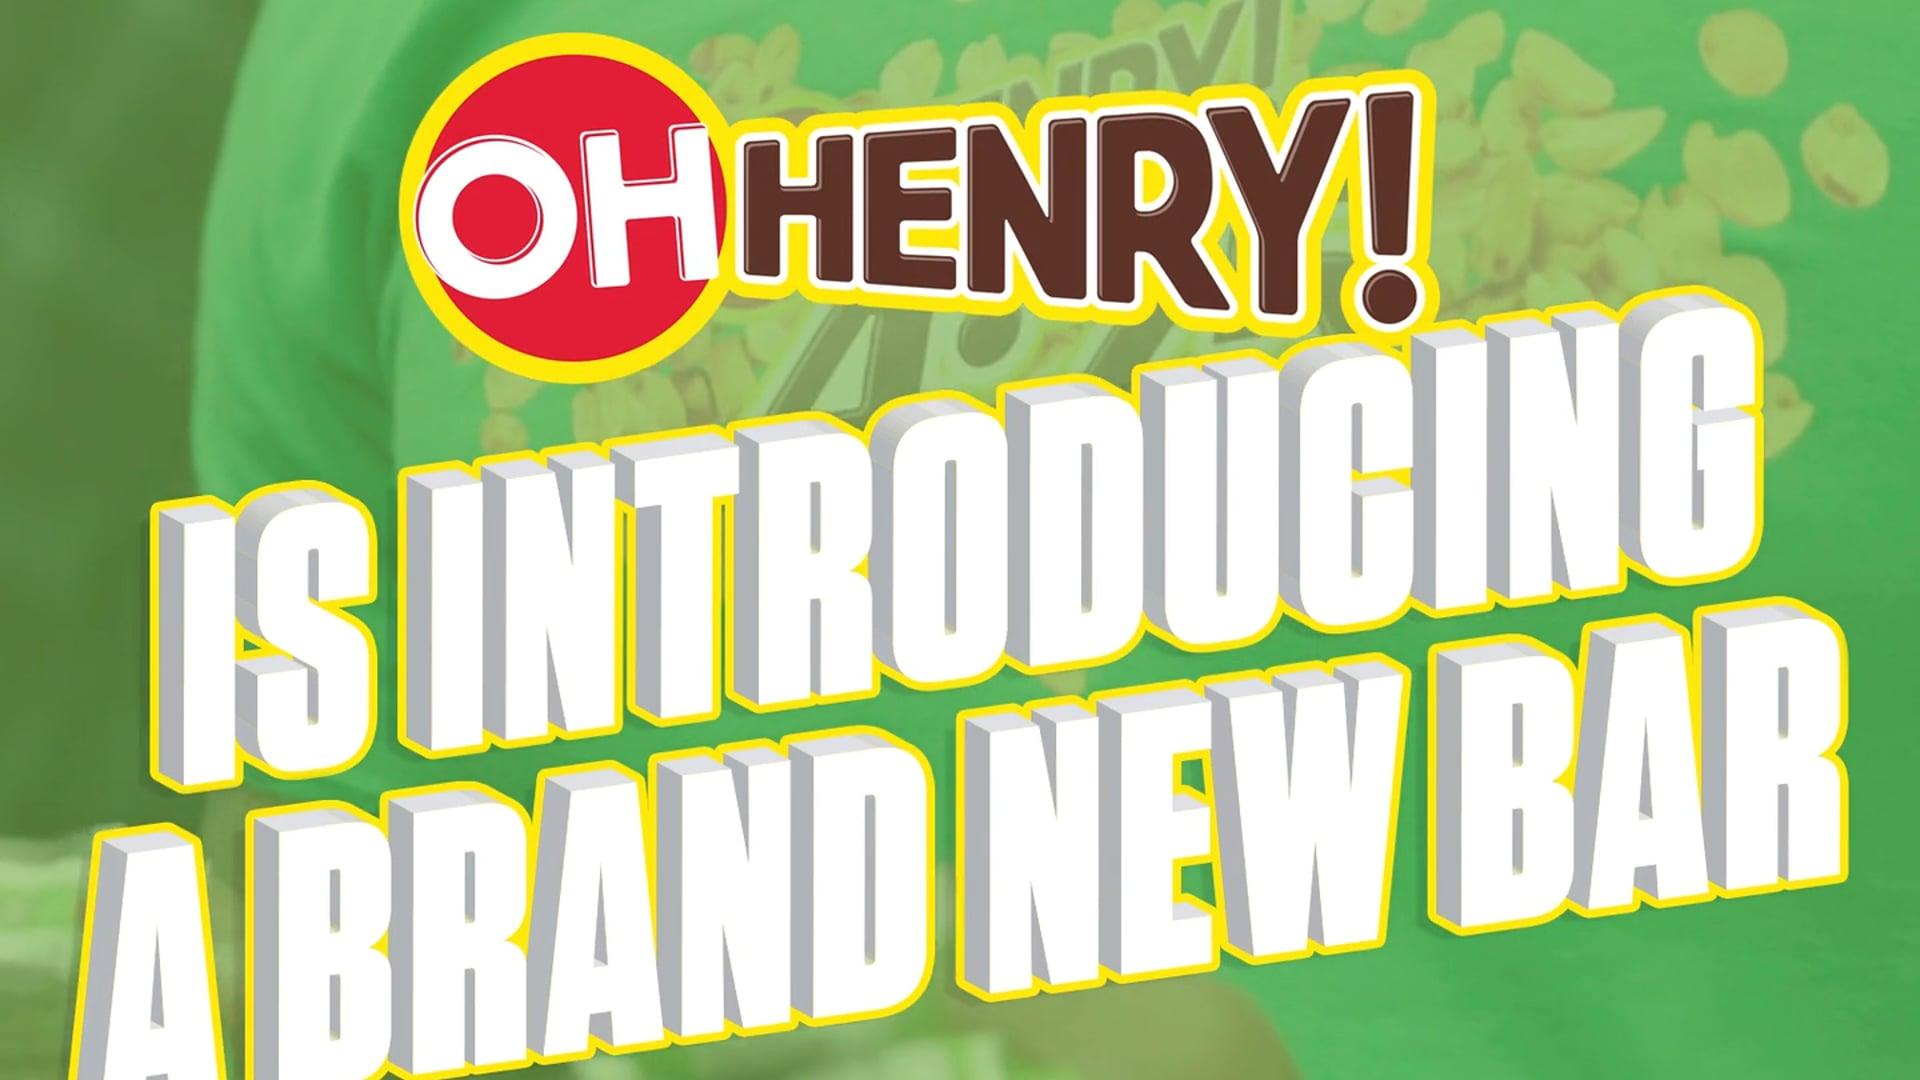 Oh Henry! 4:25 Bar Promo